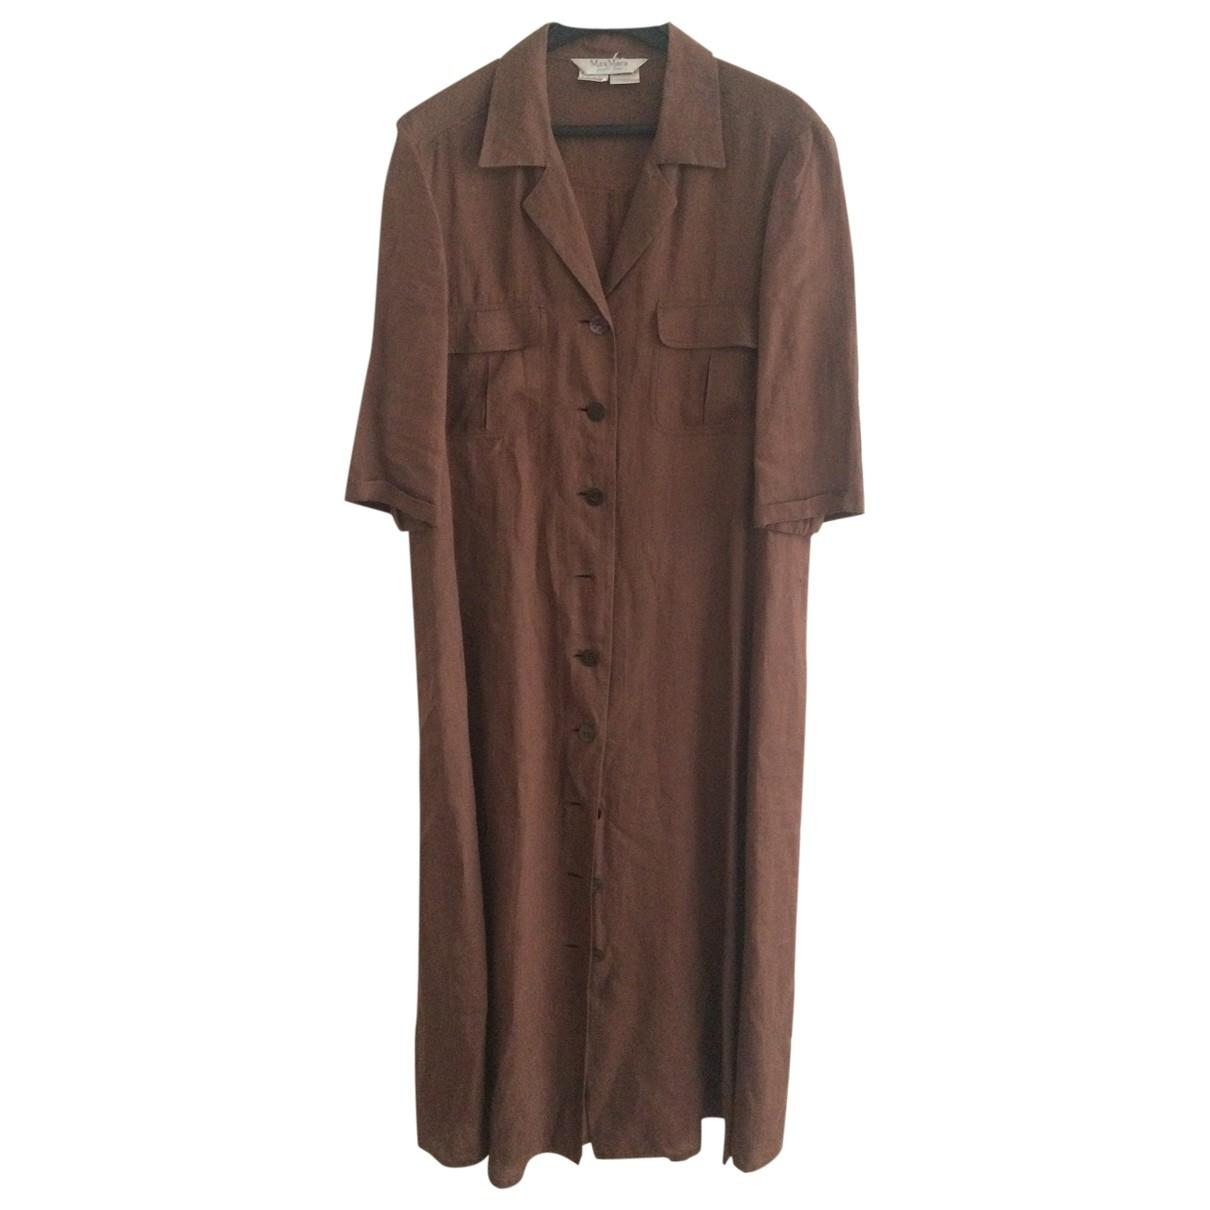 Max Mara \N Brown Linen dress for Women 46 IT